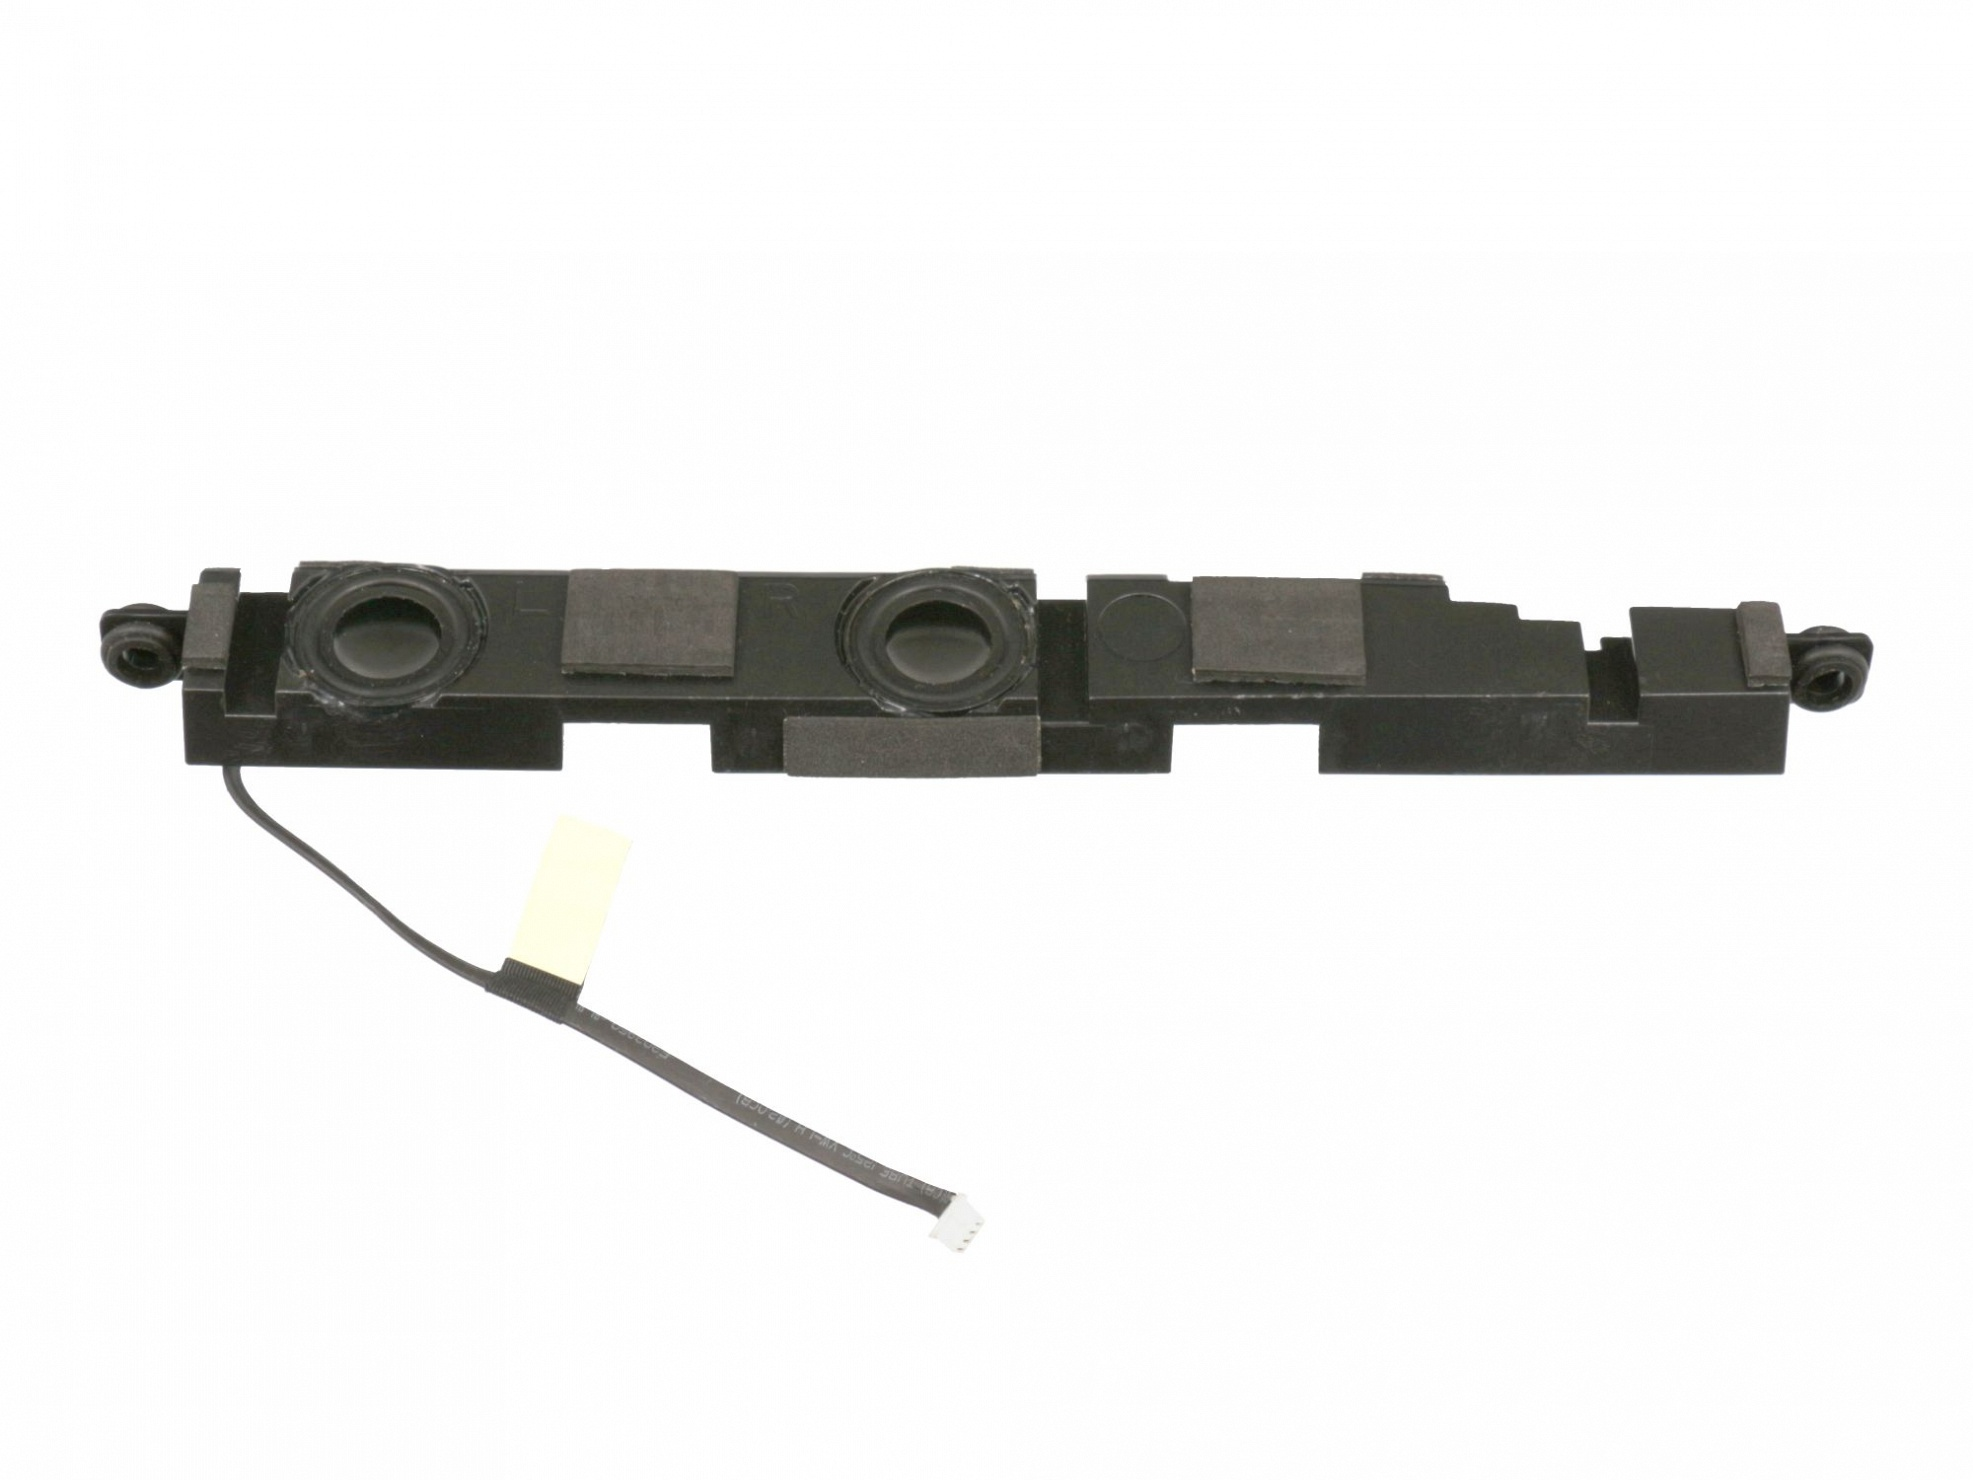 SPV230 Lautsprecher (Haupt-Lautsprecher) Original